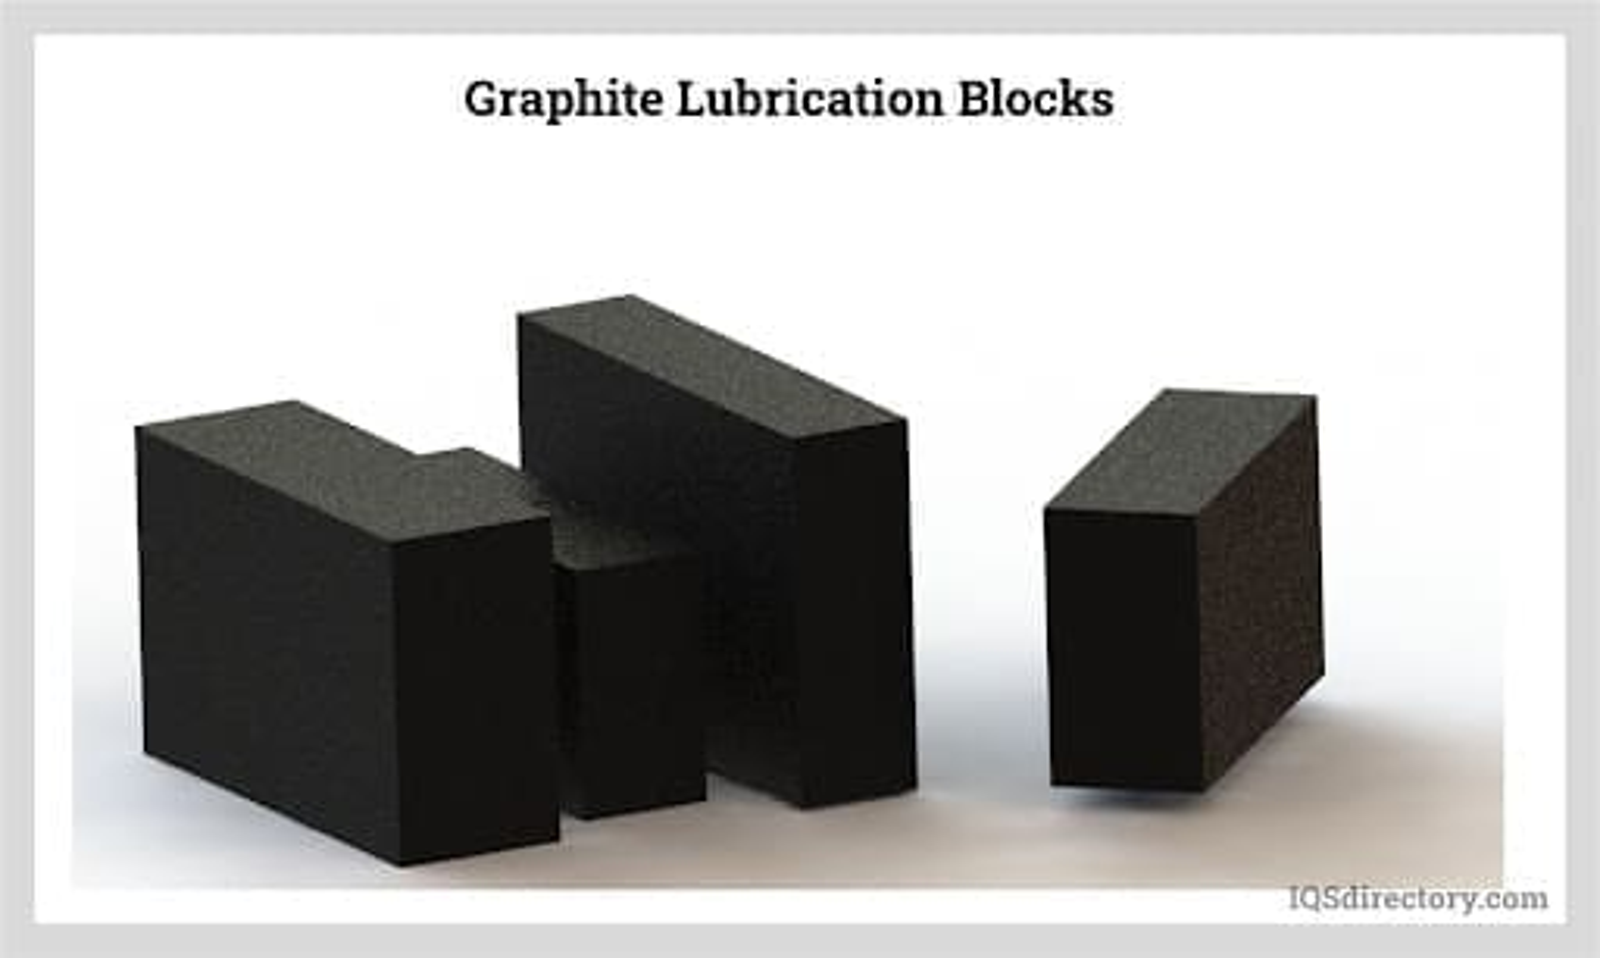 Graphite Lubrication Blocks